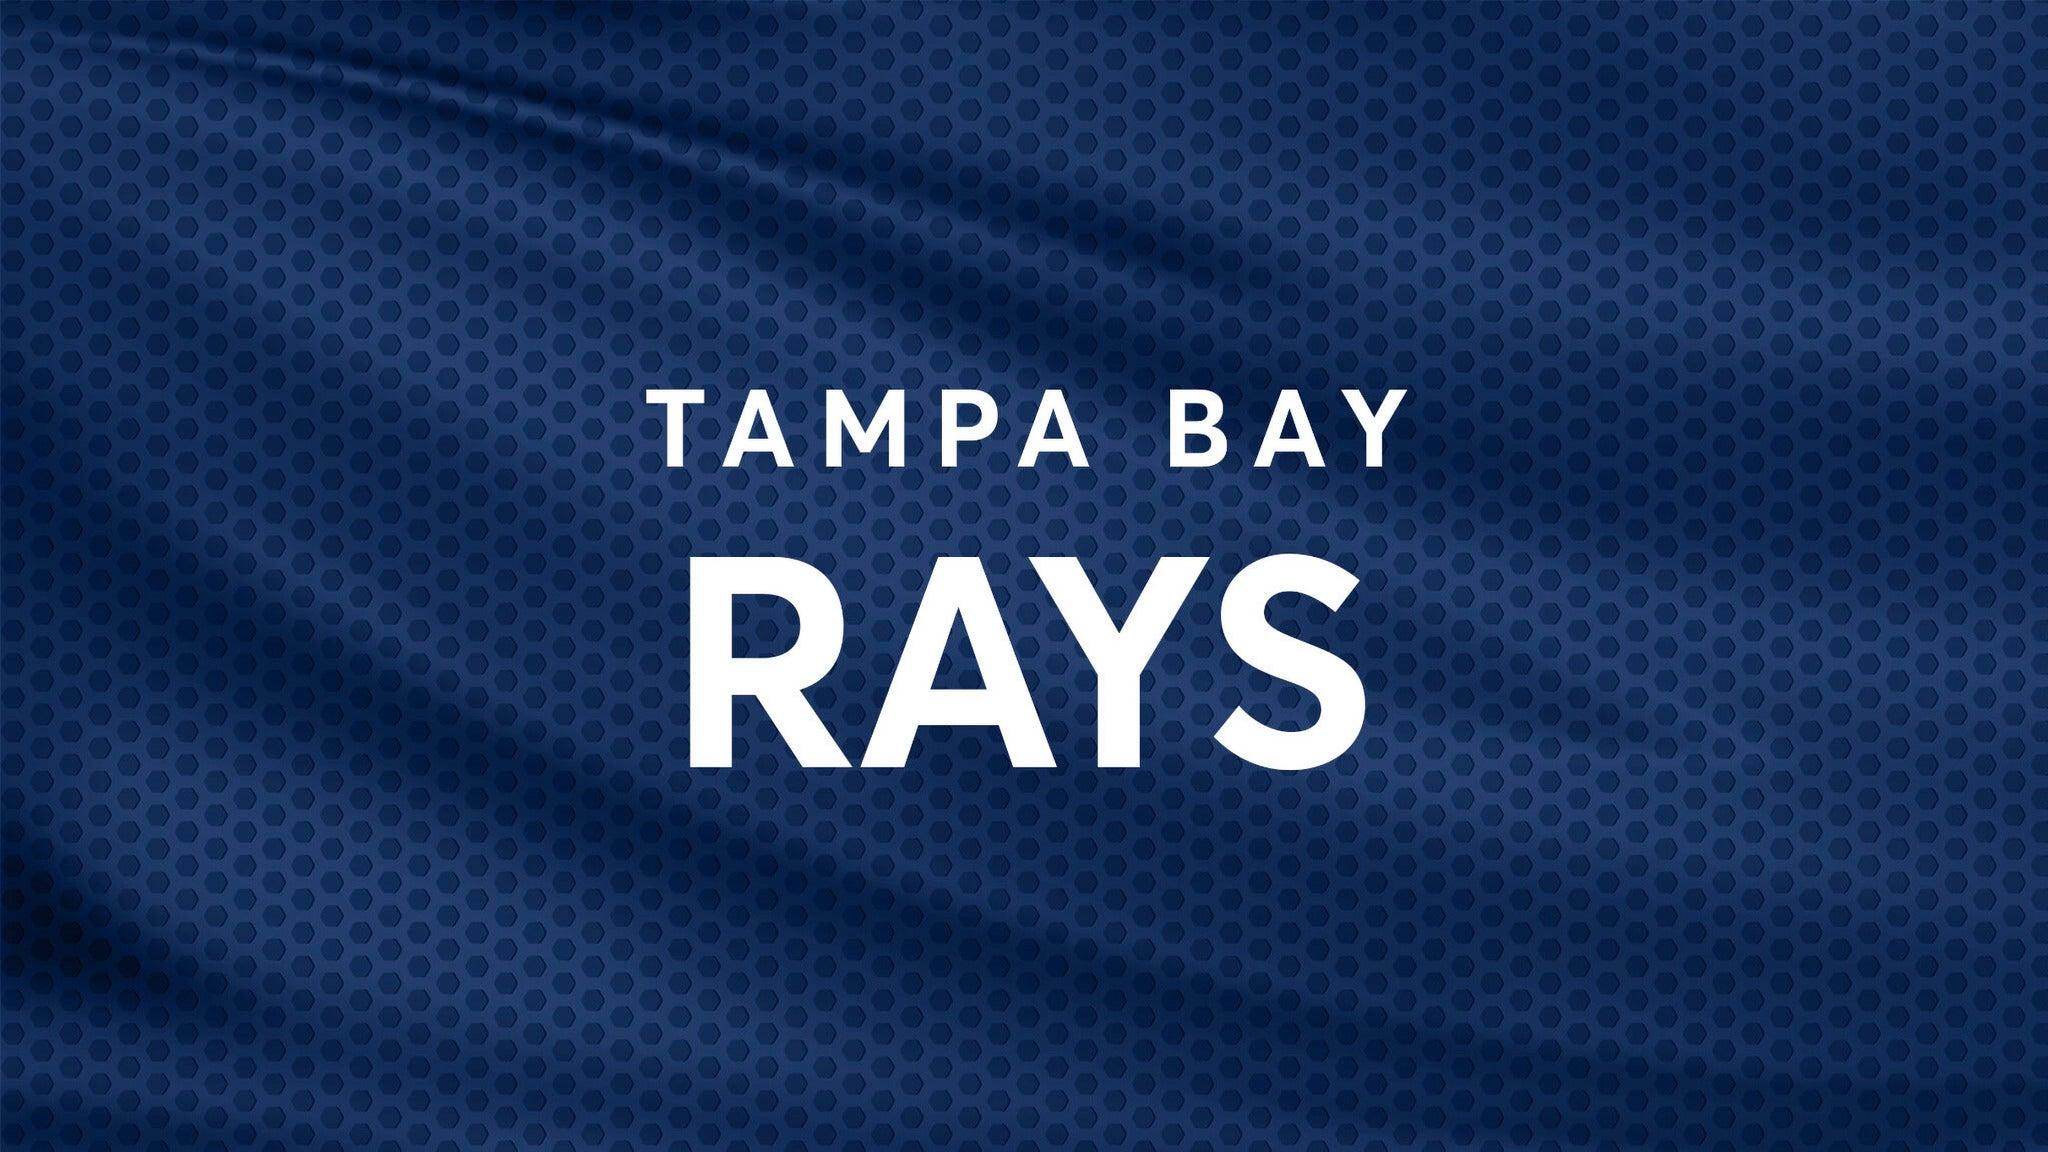 Tampa Bay Rays vs. Chicago White Sox